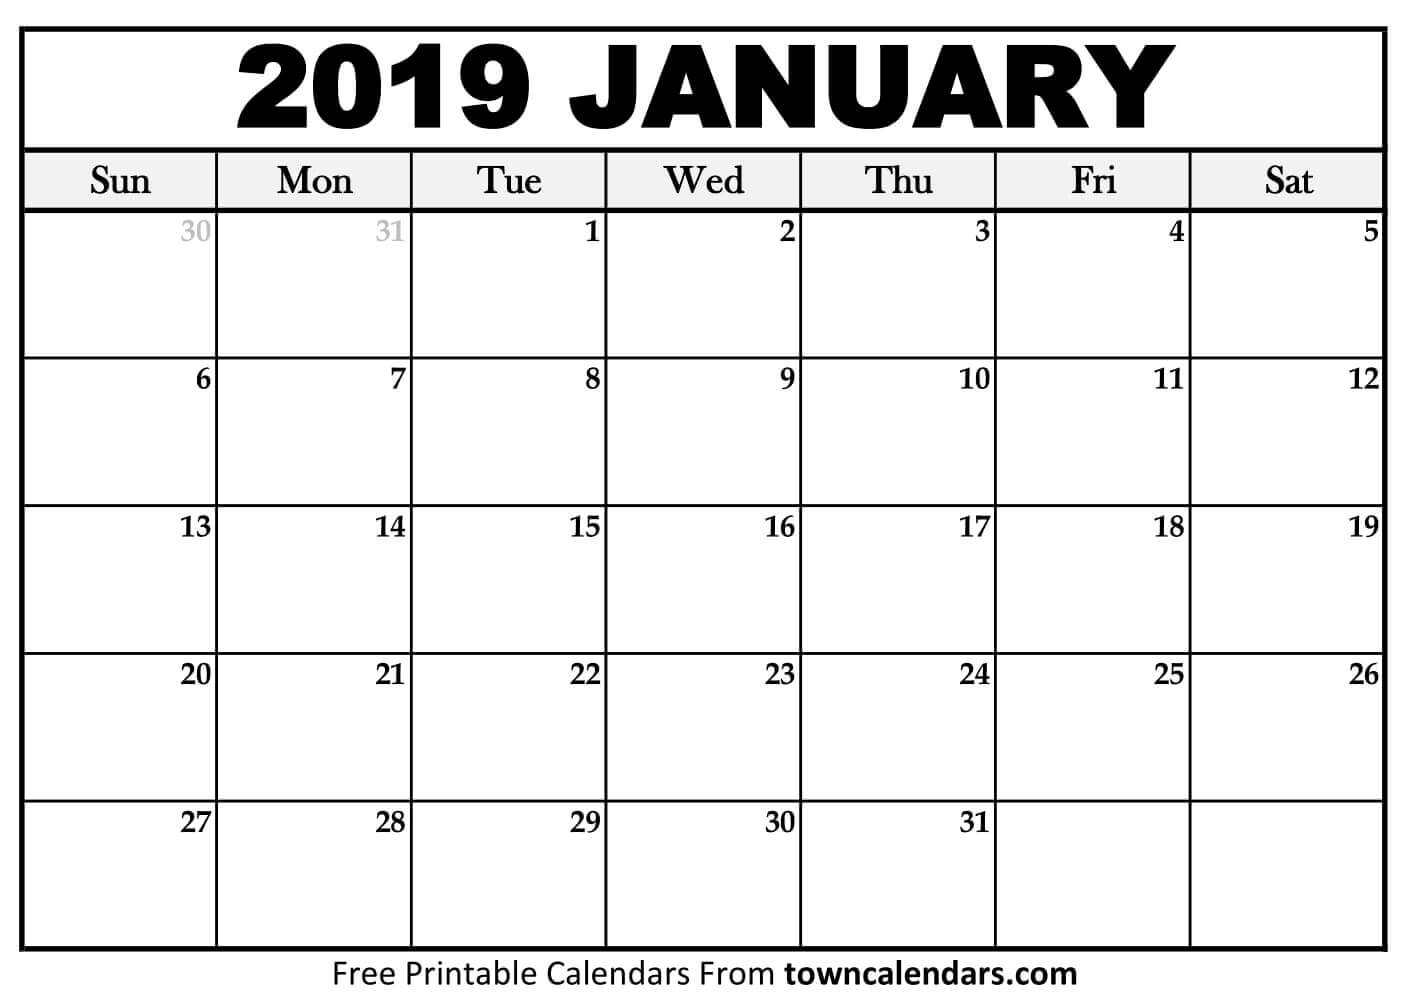 Printable January 2019 Calendar – Towncalendars Calendar 2019 January